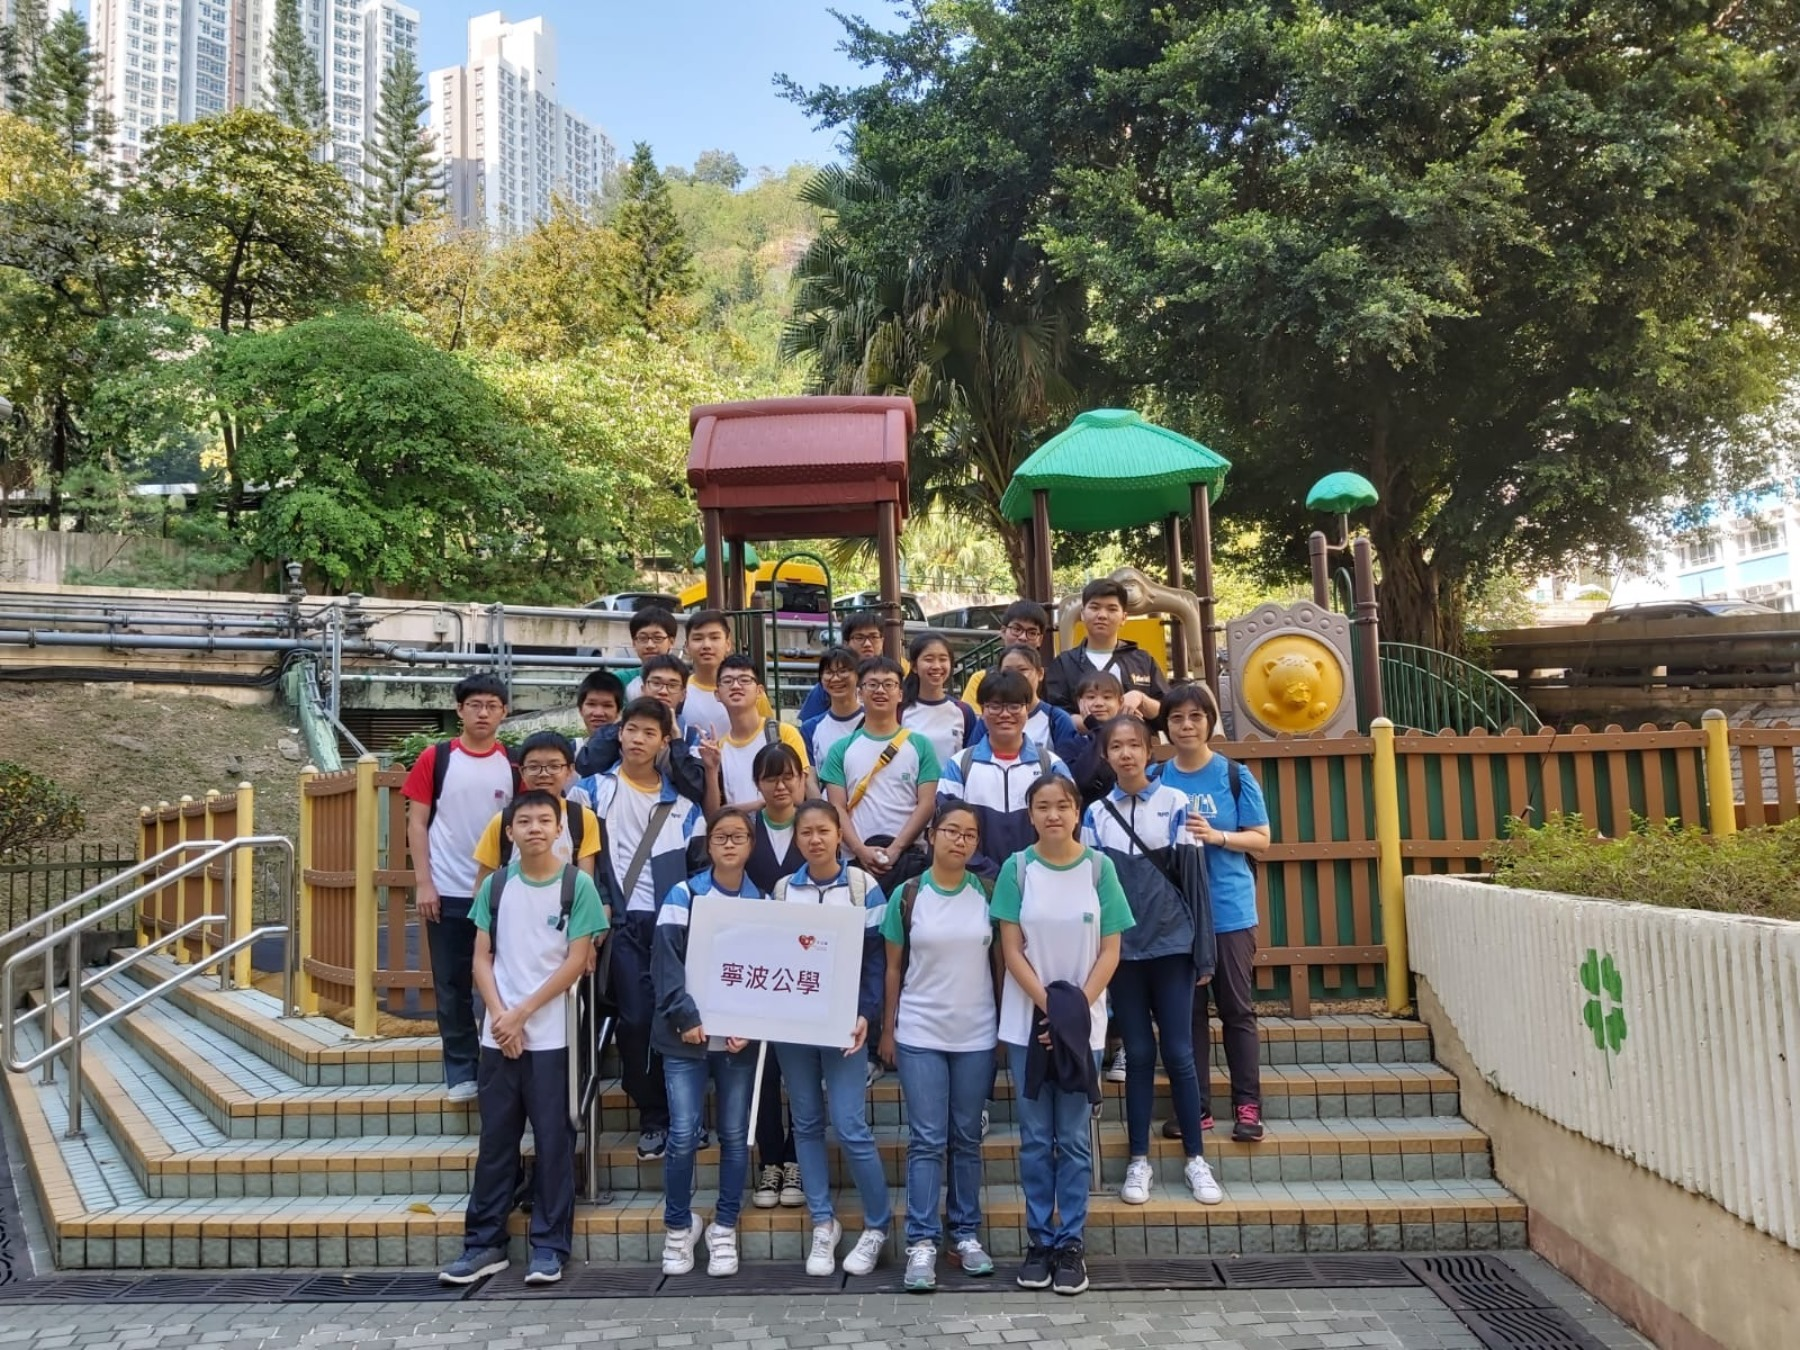 https://www.npc.edu.hk/sites/default/files/6_530.jpg